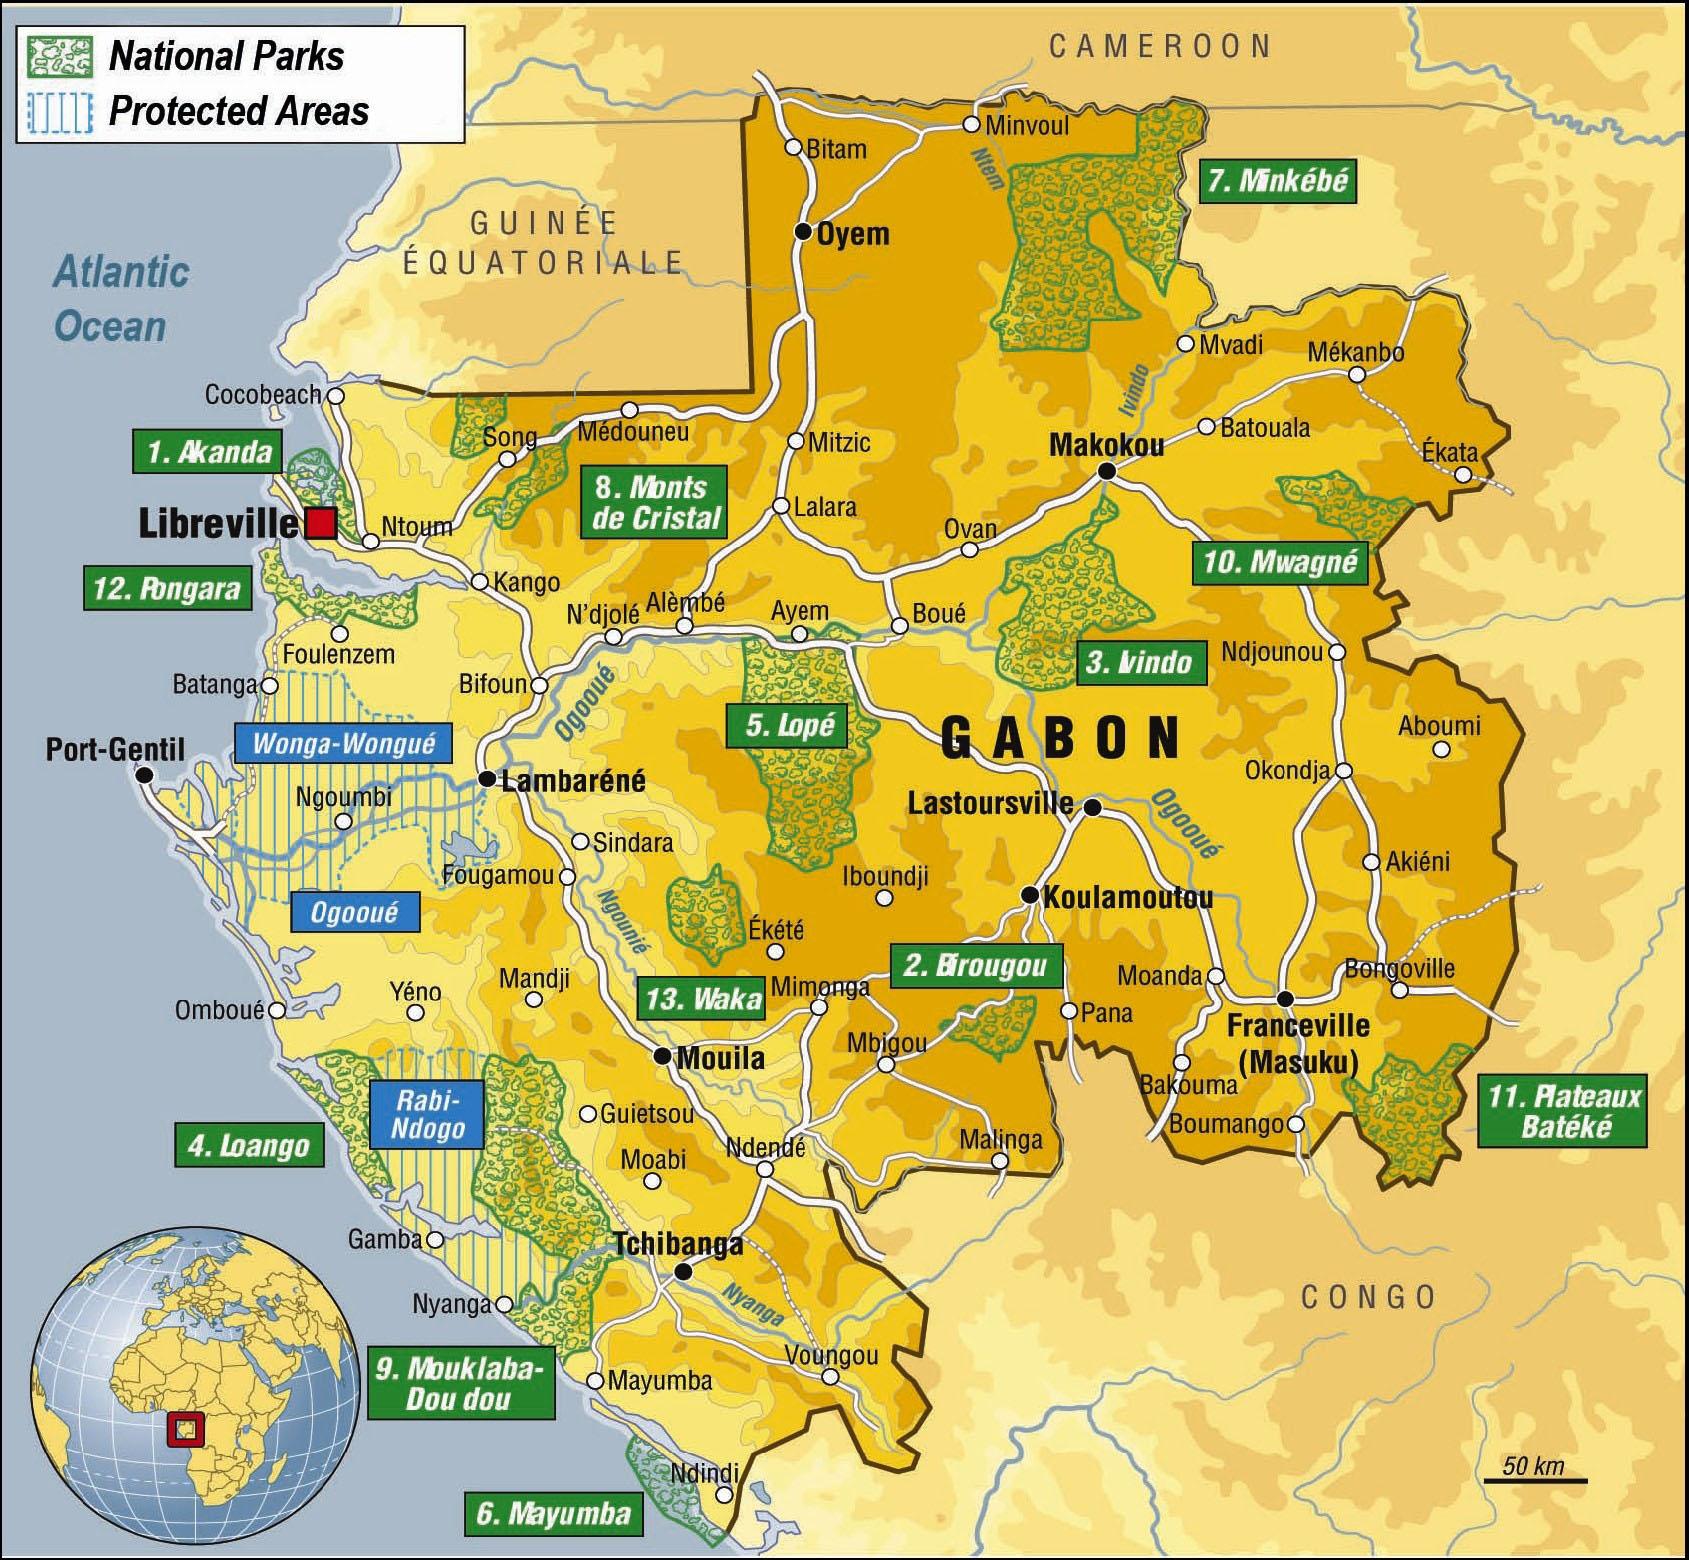 Detailed tourist map of Gabon Gabon detailed tourist map Vidiani